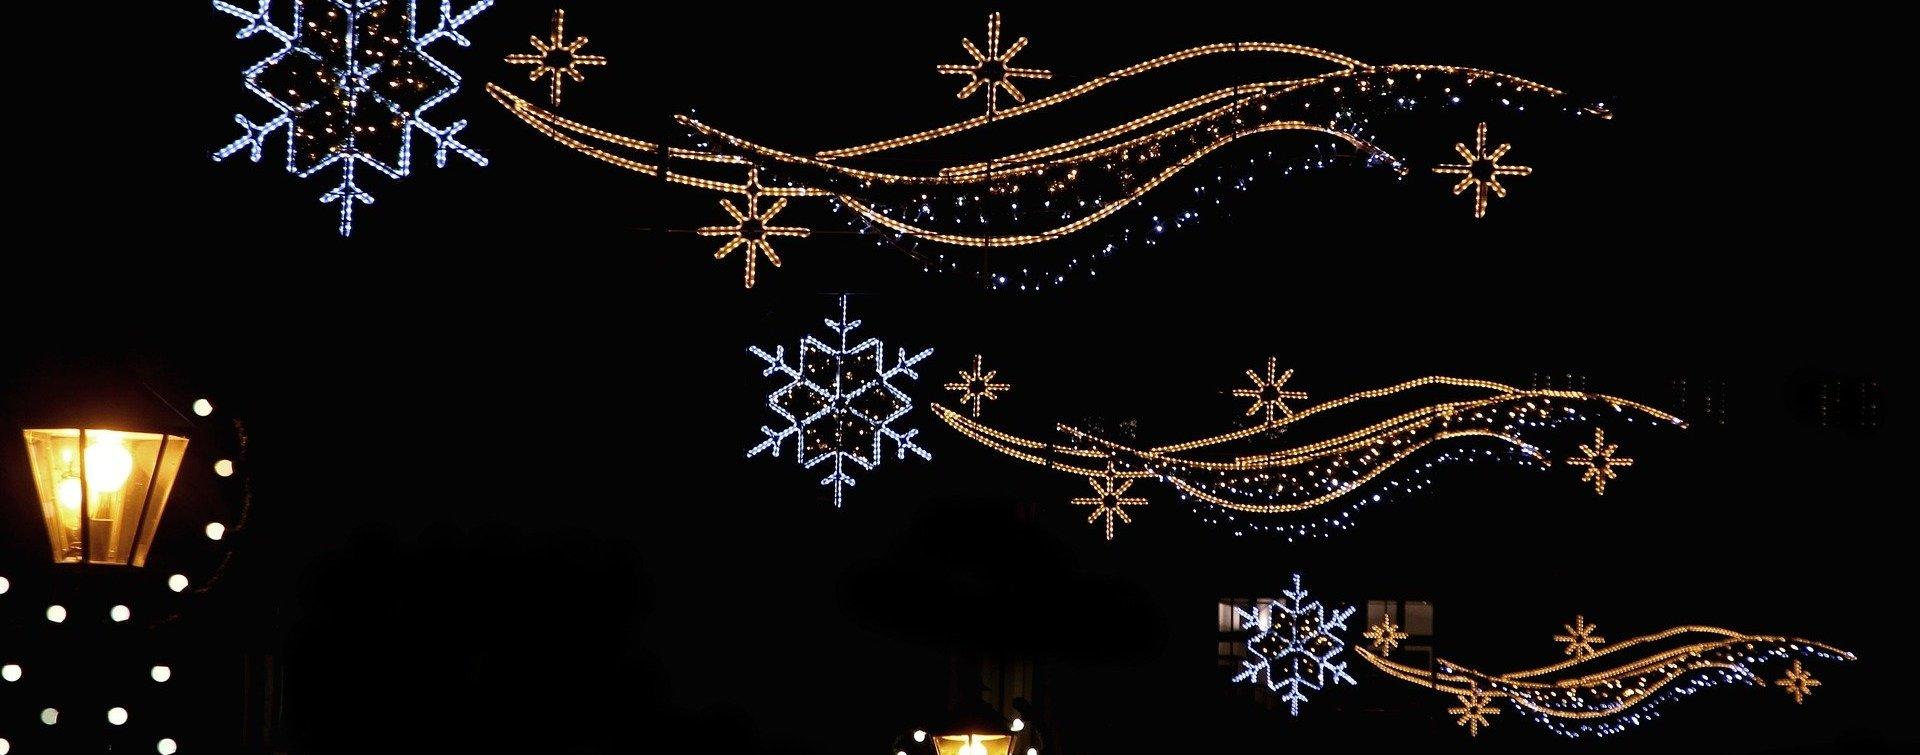 Illuminations de Noël dans l'Orne